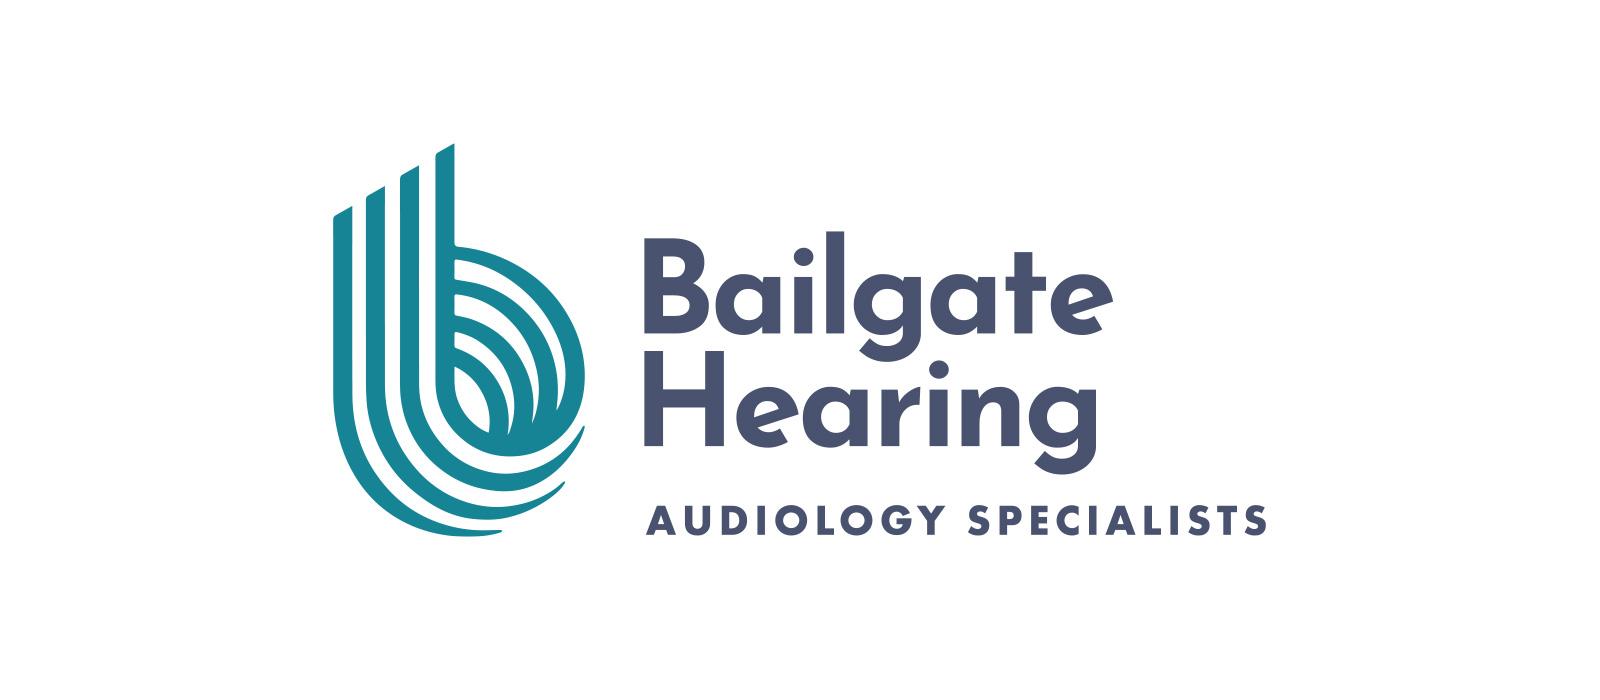 Bailgate Hearing